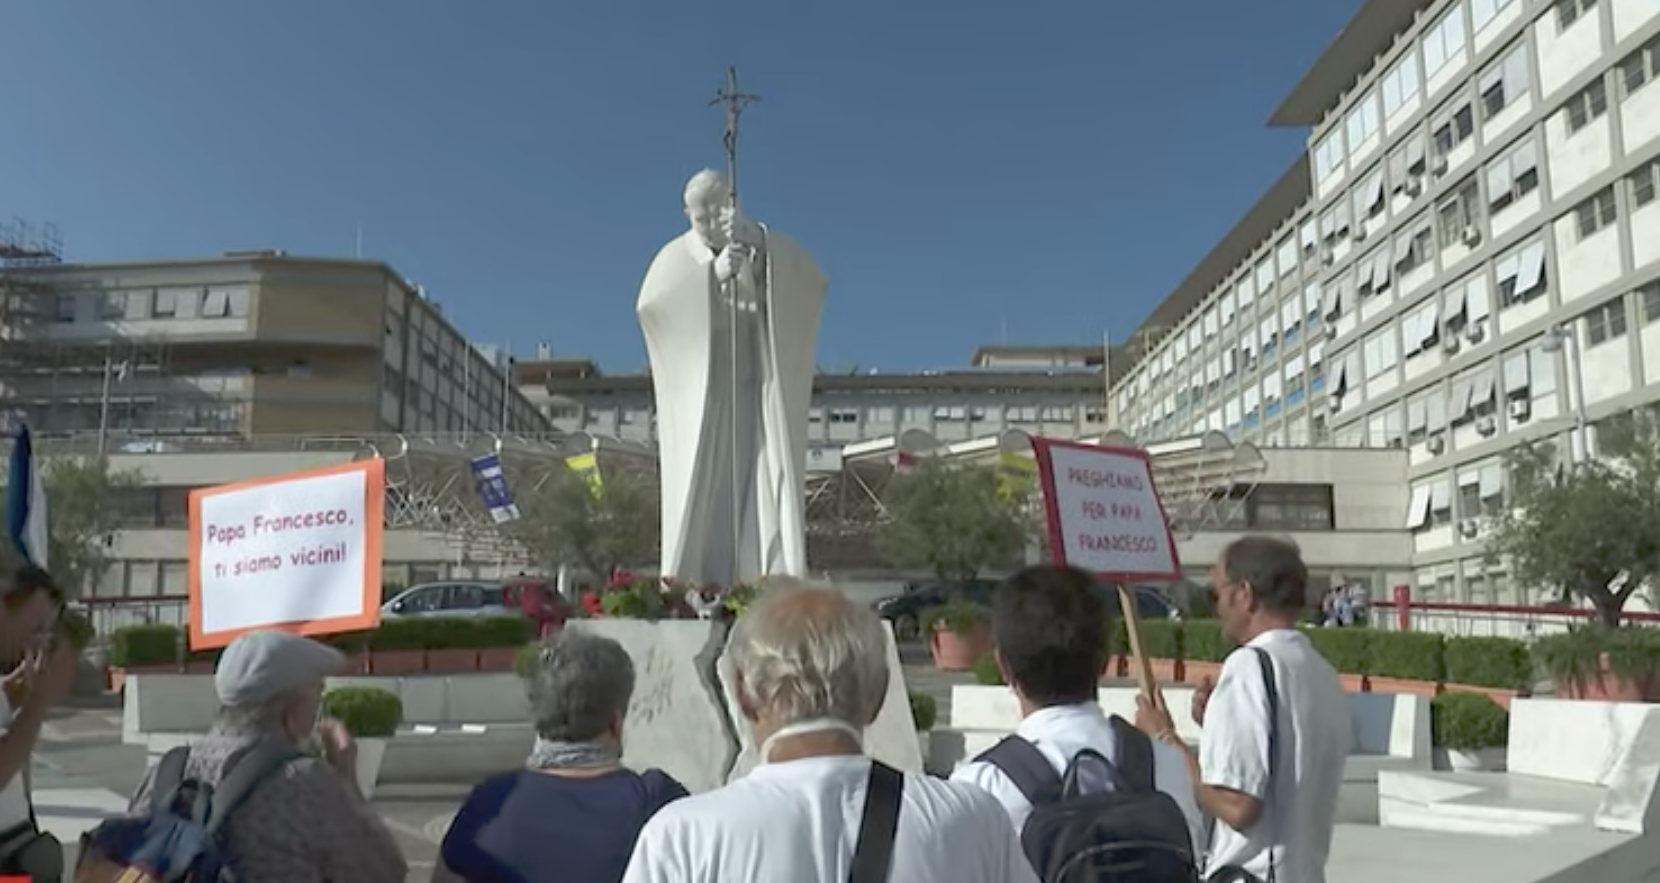 Hôpital Agostino Gemelli de Rome, capture Zenit / Vatican News